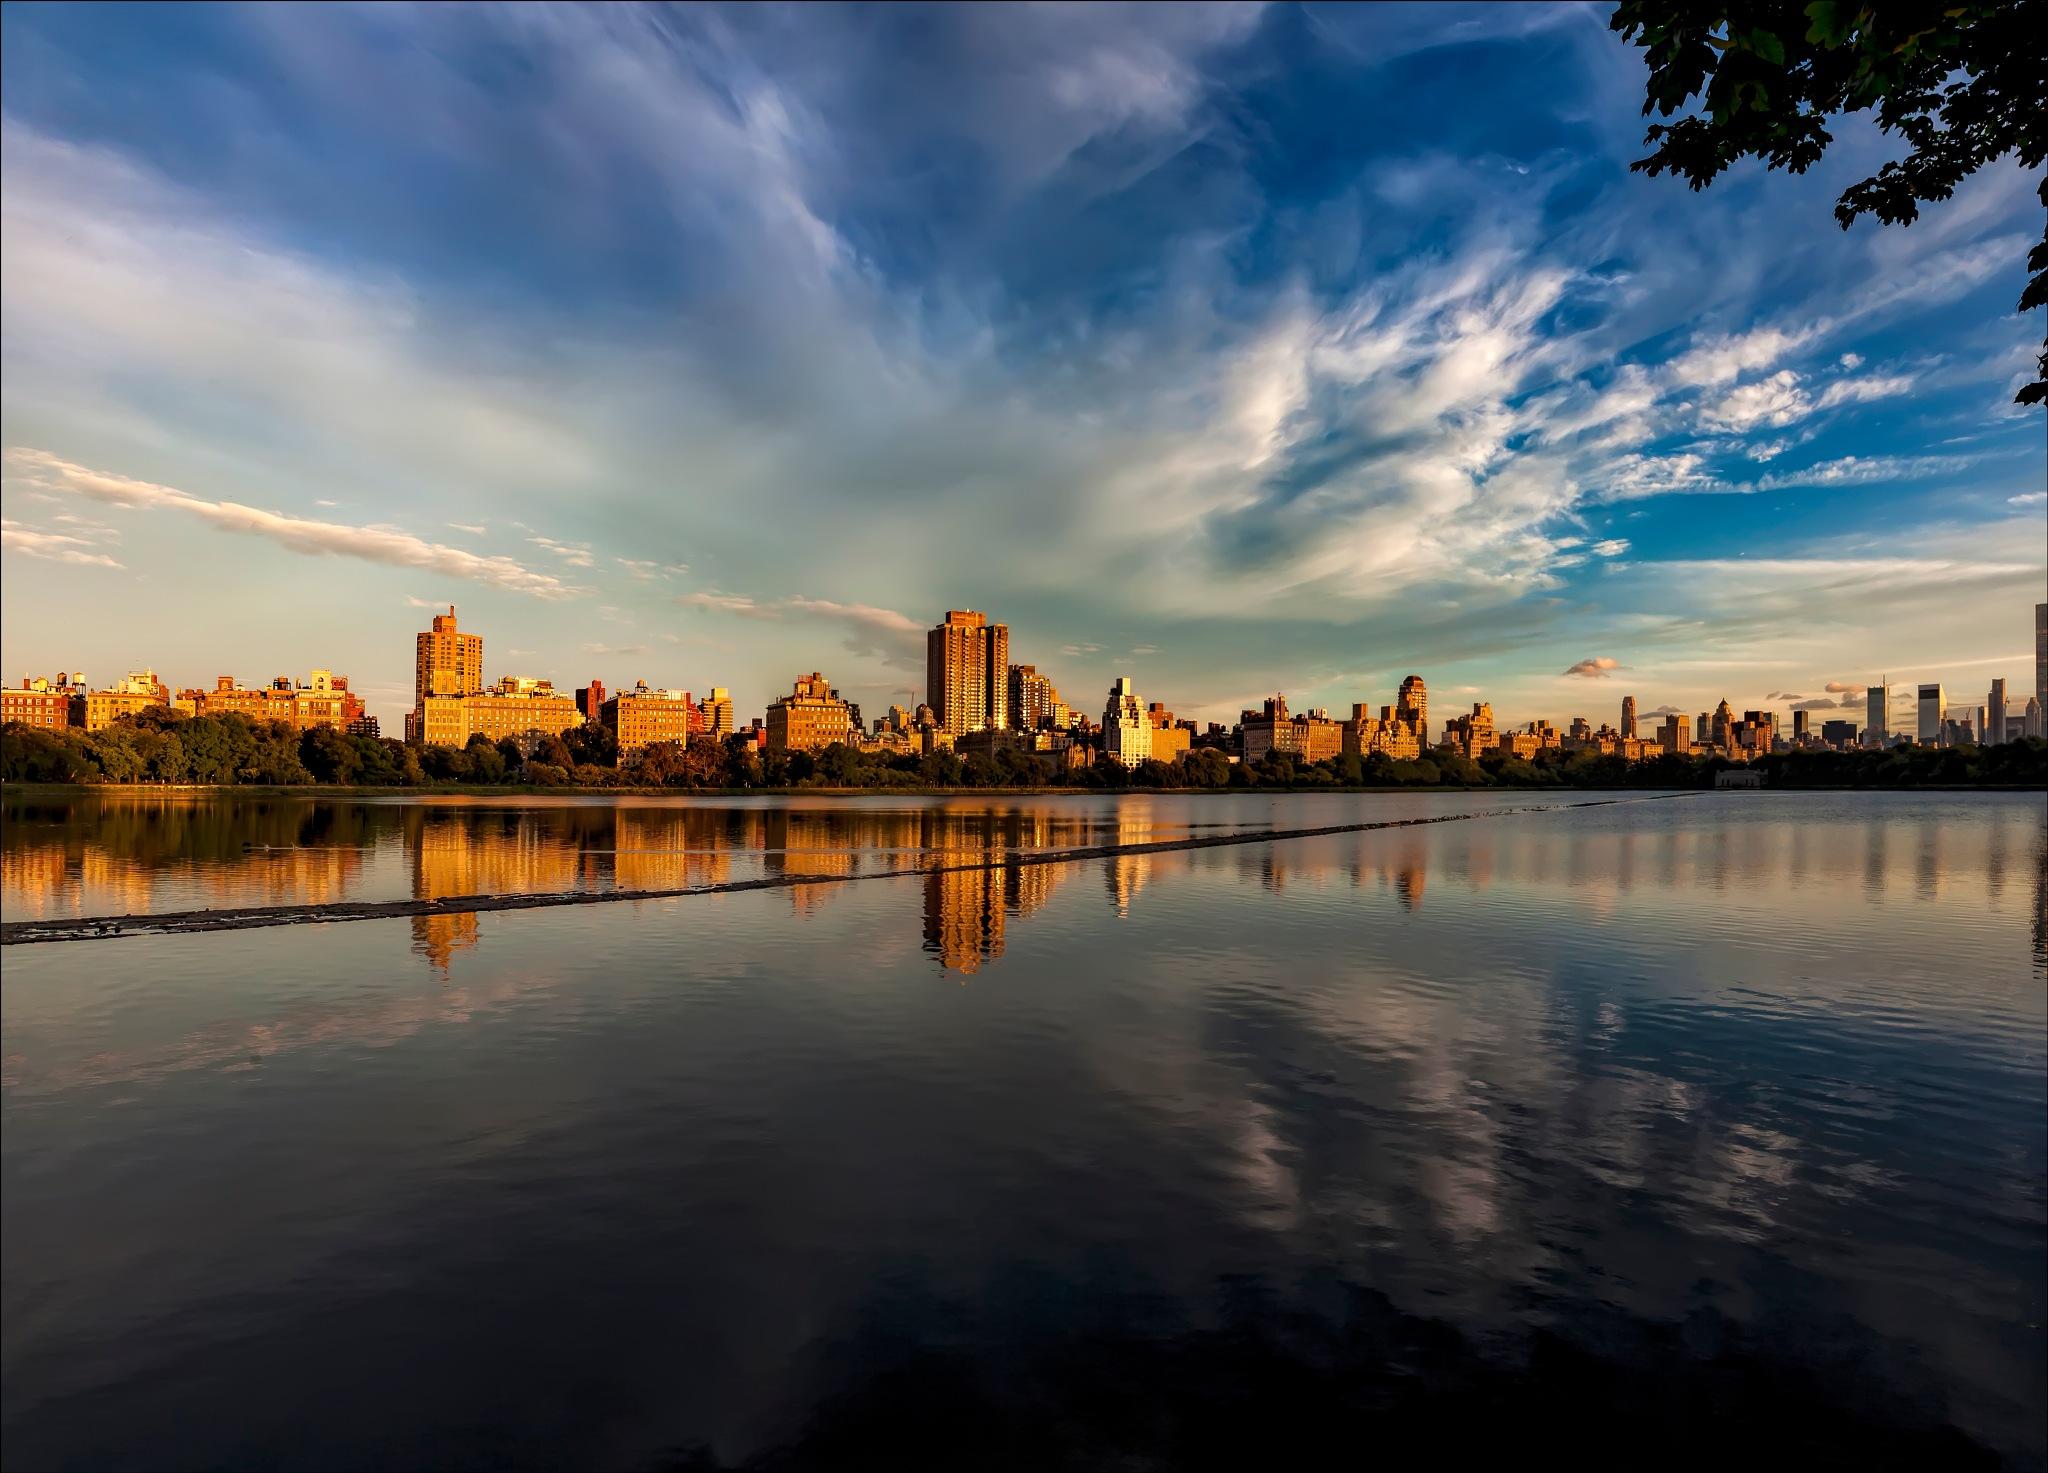 Central Park Reservoir NYC by robertullmann